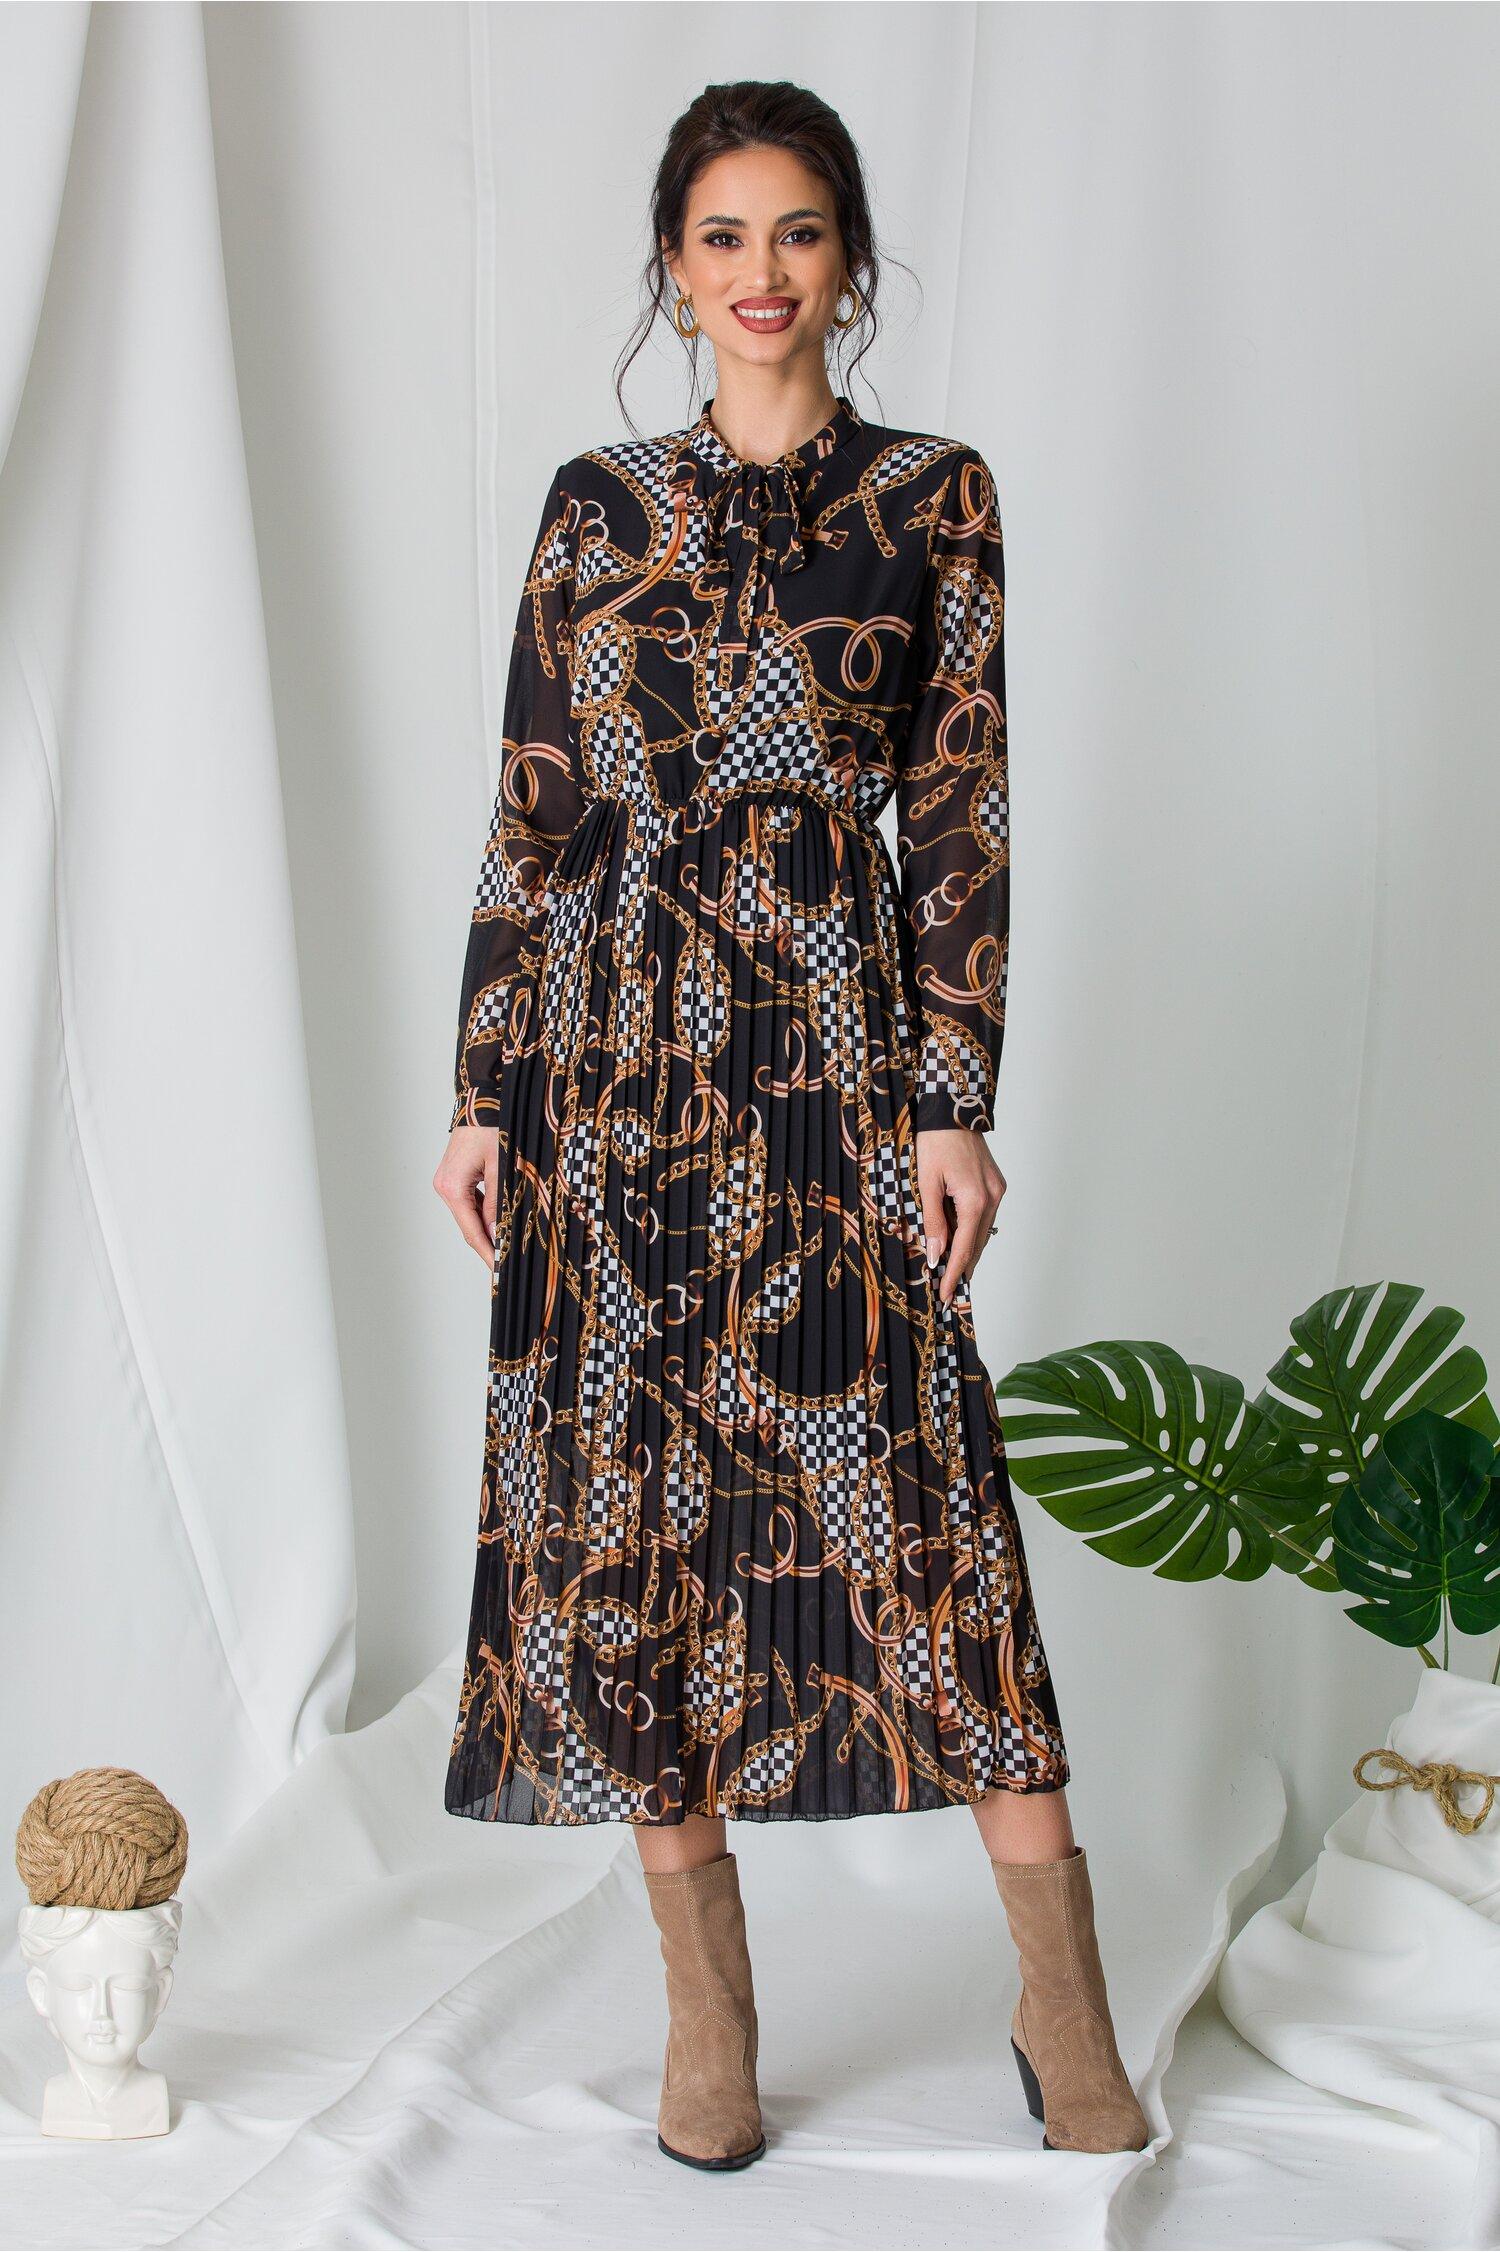 Rochie Alina neagra cu imprimeu chain si fusta plisata imagine dyfashion.ro 2021